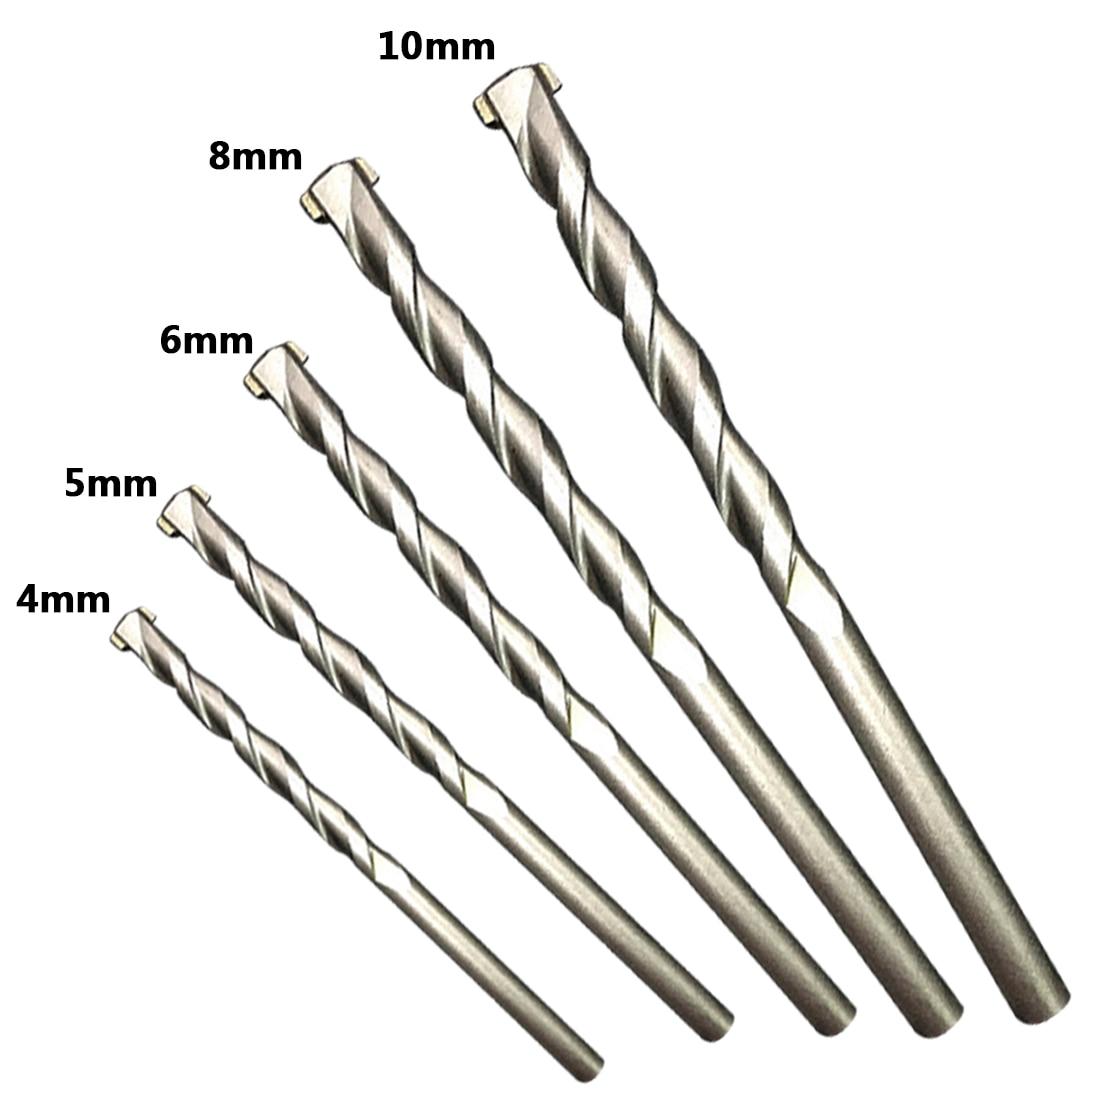 High Quality 5 Pcs Spiral Drill Bit Set For Wood 4mm 5mm 6mm 8mm /& 10mm Sizes